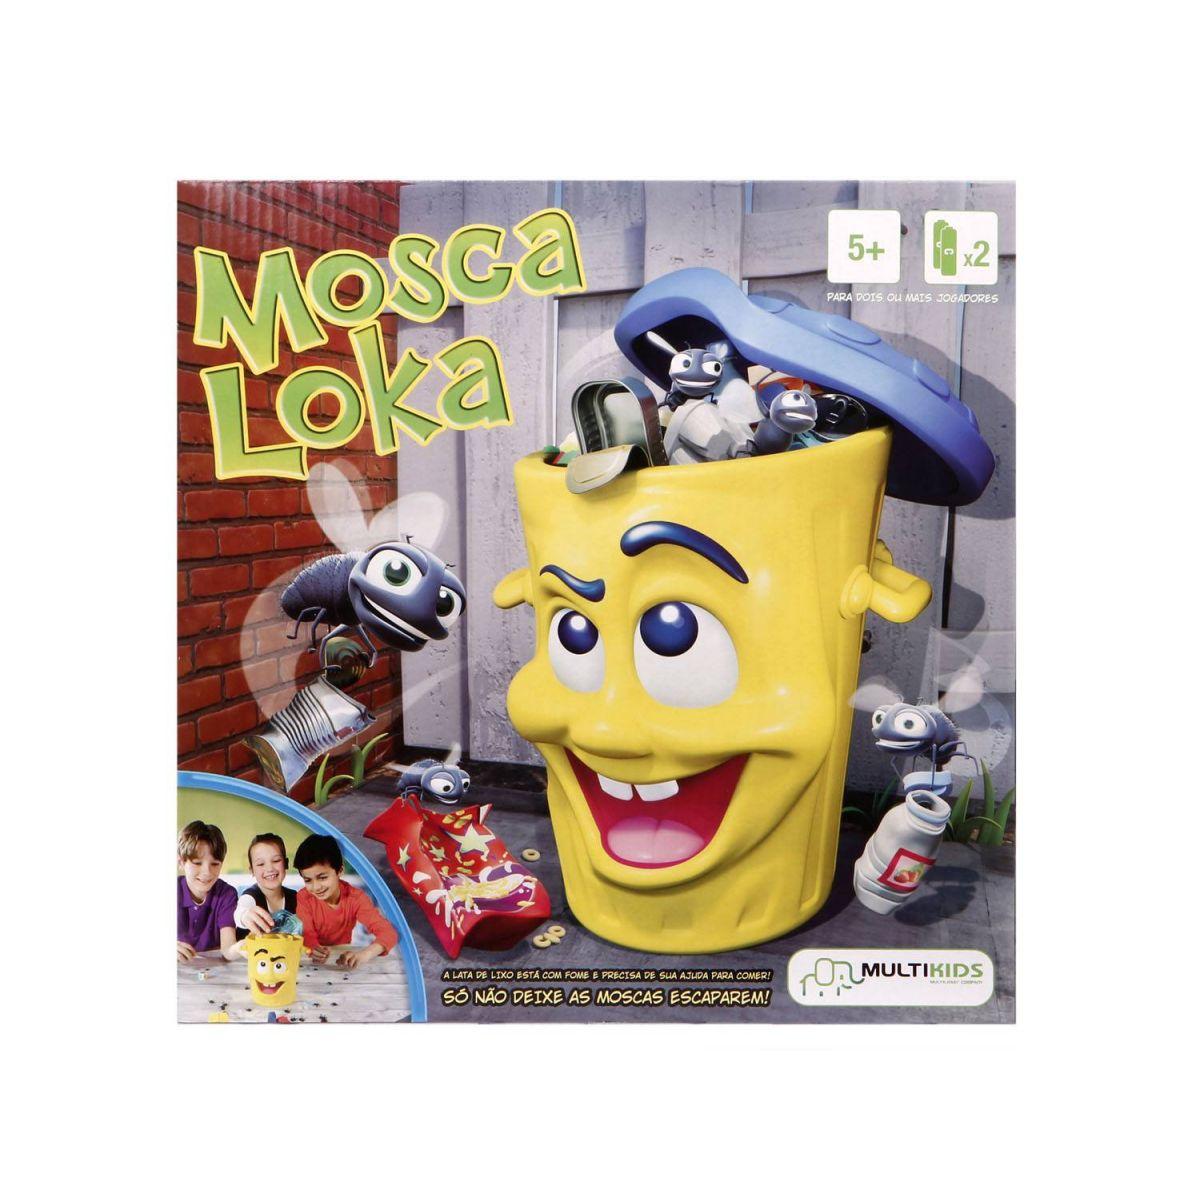 Jogo Mosca Loka - MultiKids